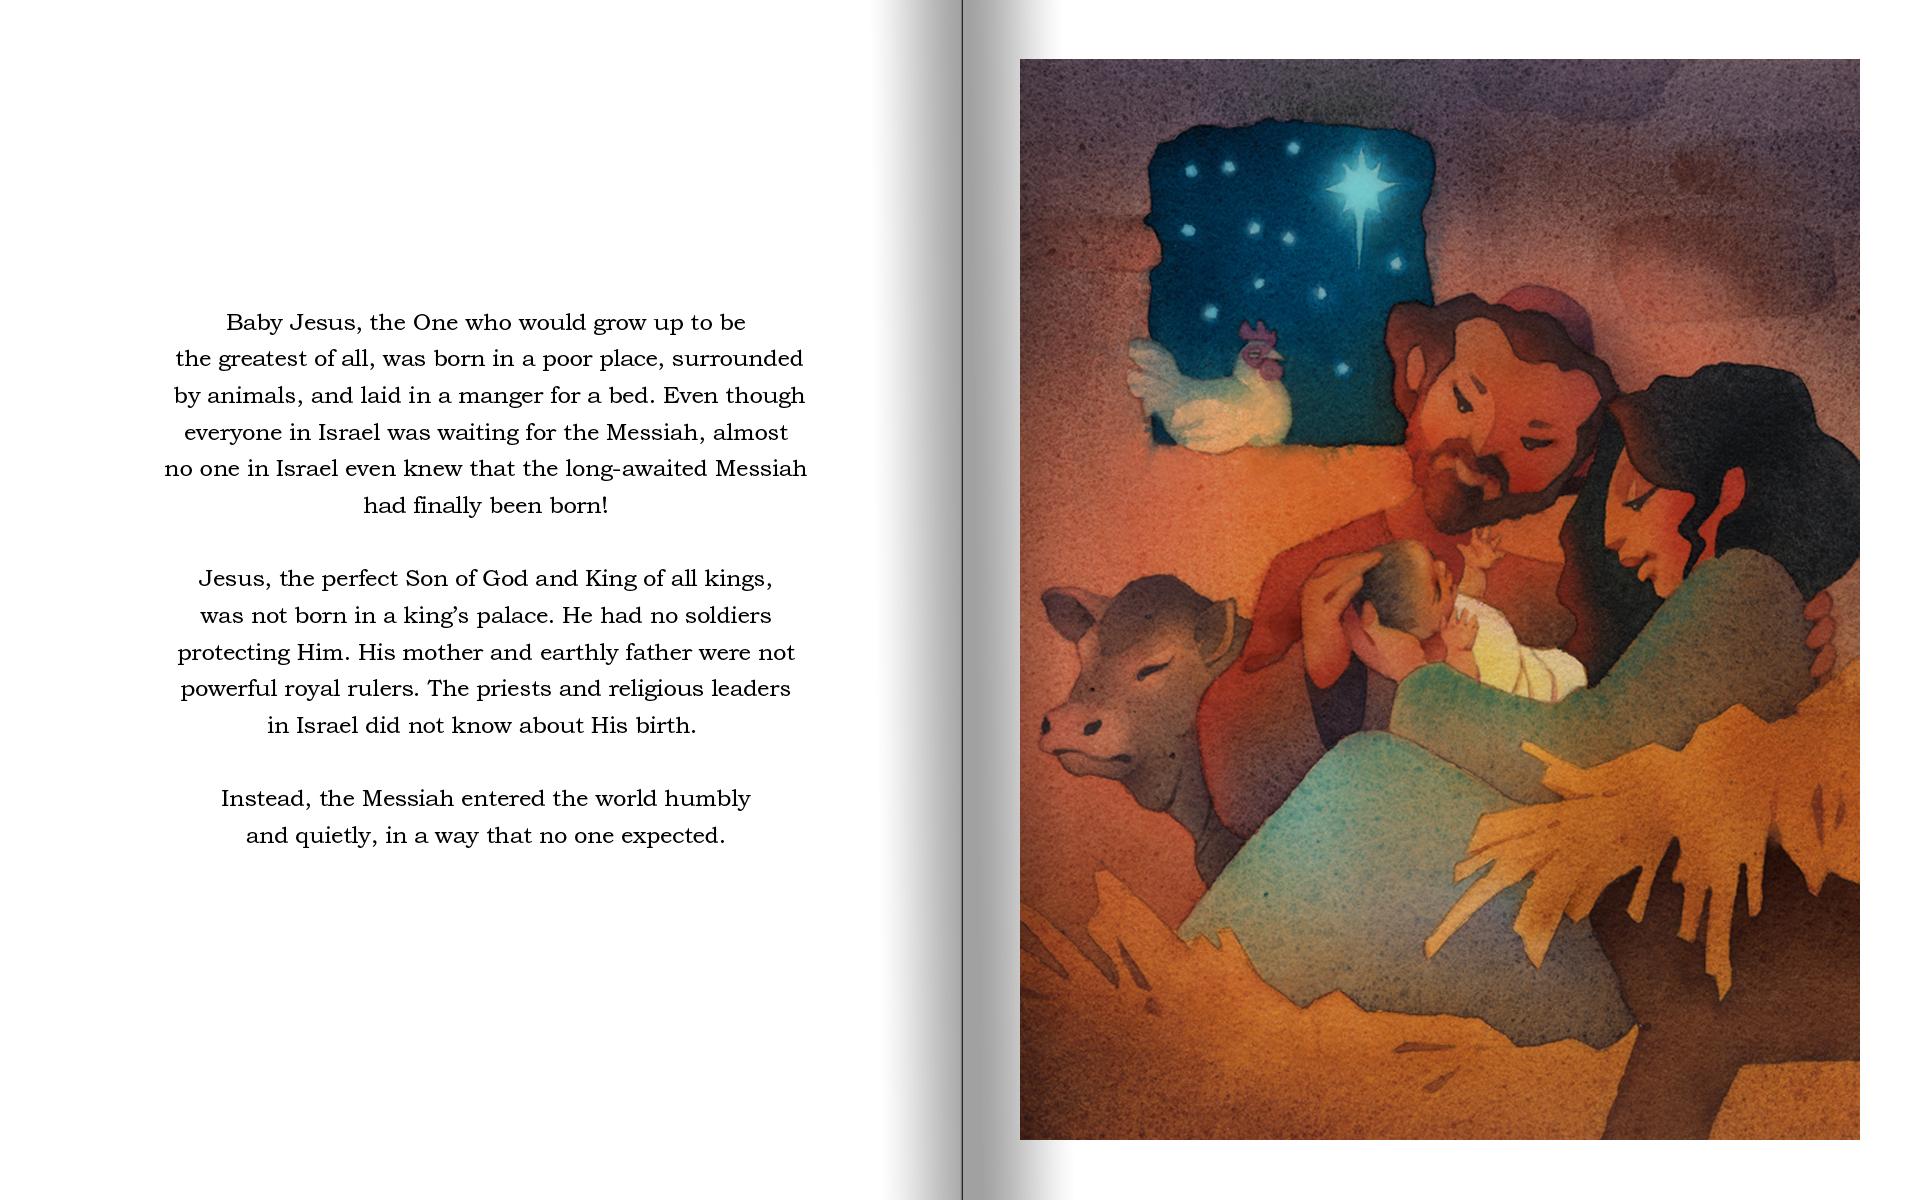 Birth of Jesus storybook